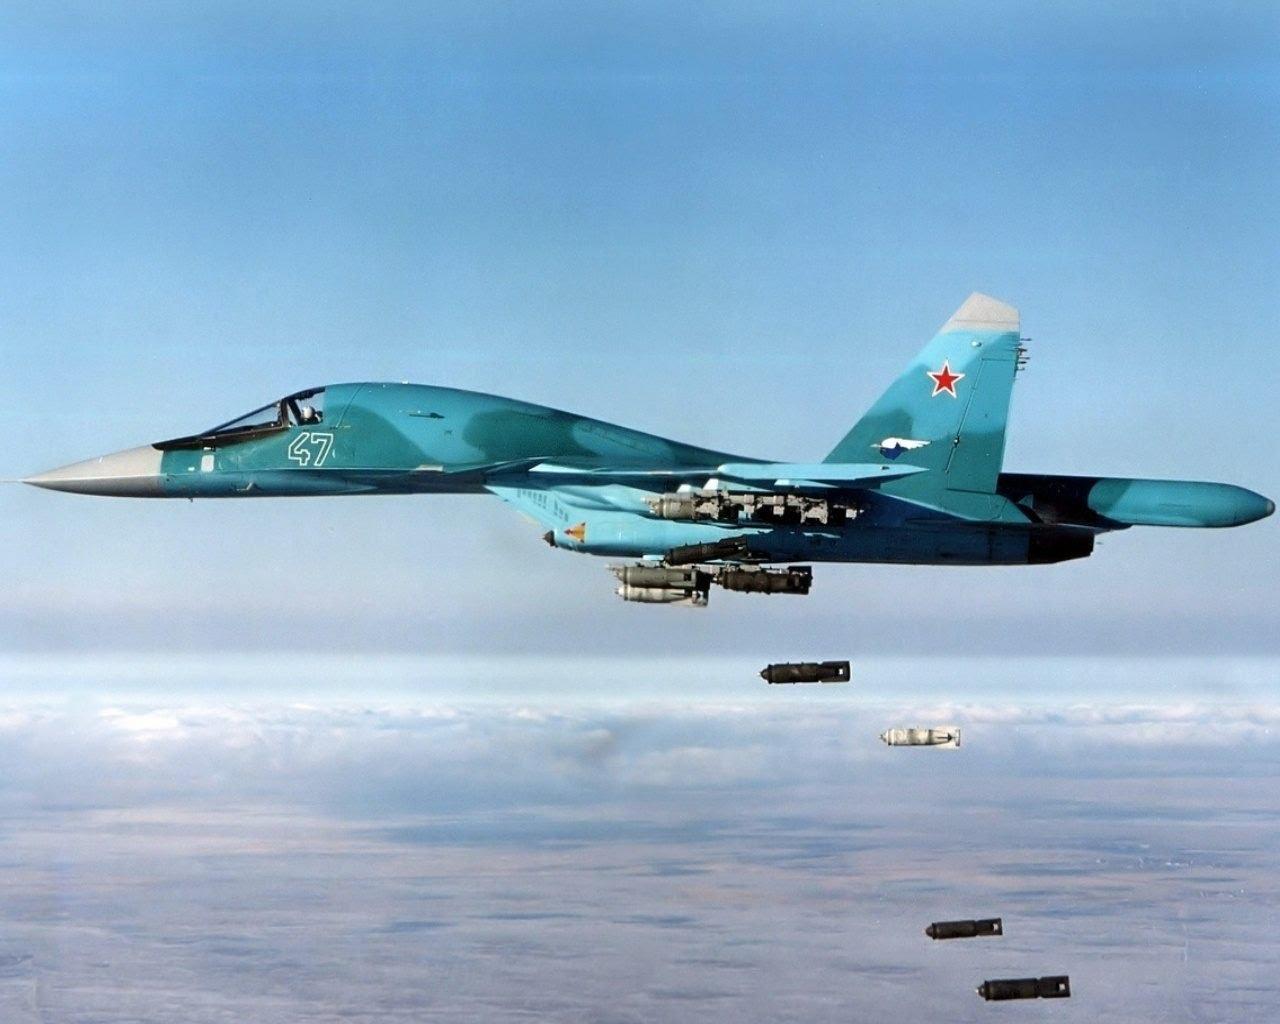 img 7 Бой с тенью - Су-34 против F-15E. Часть 3